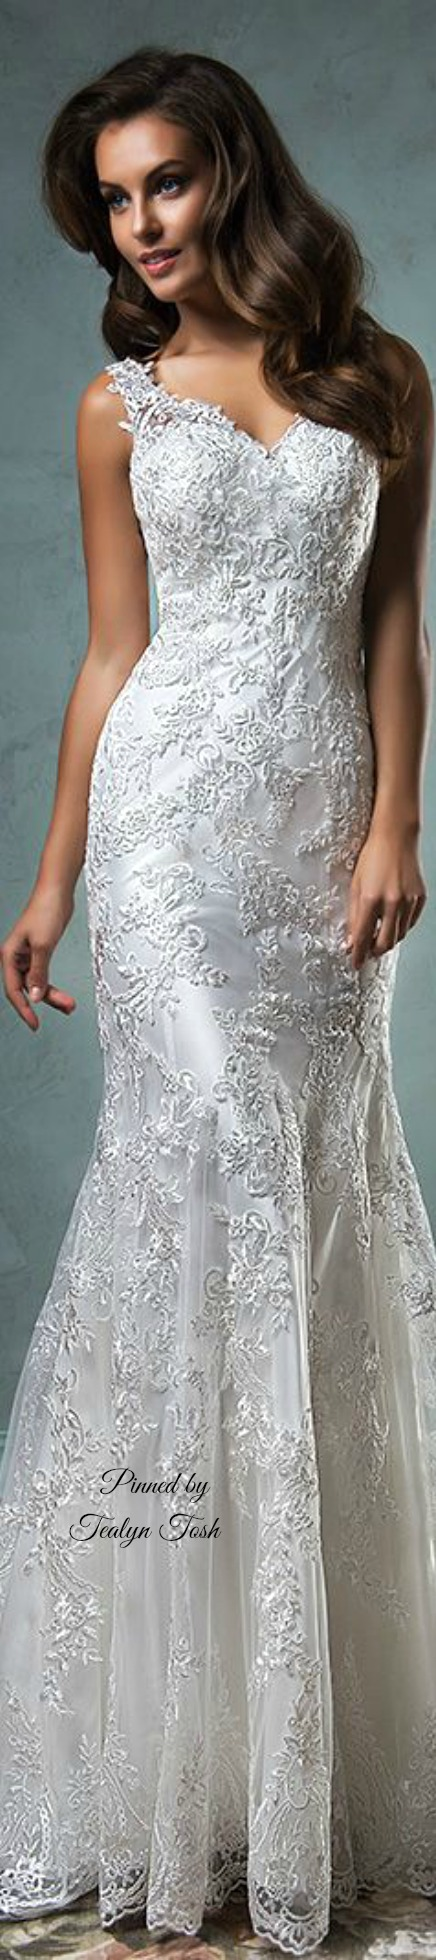 Grey lace wedding dress  Amelia Sposa   Tealyn Tosh